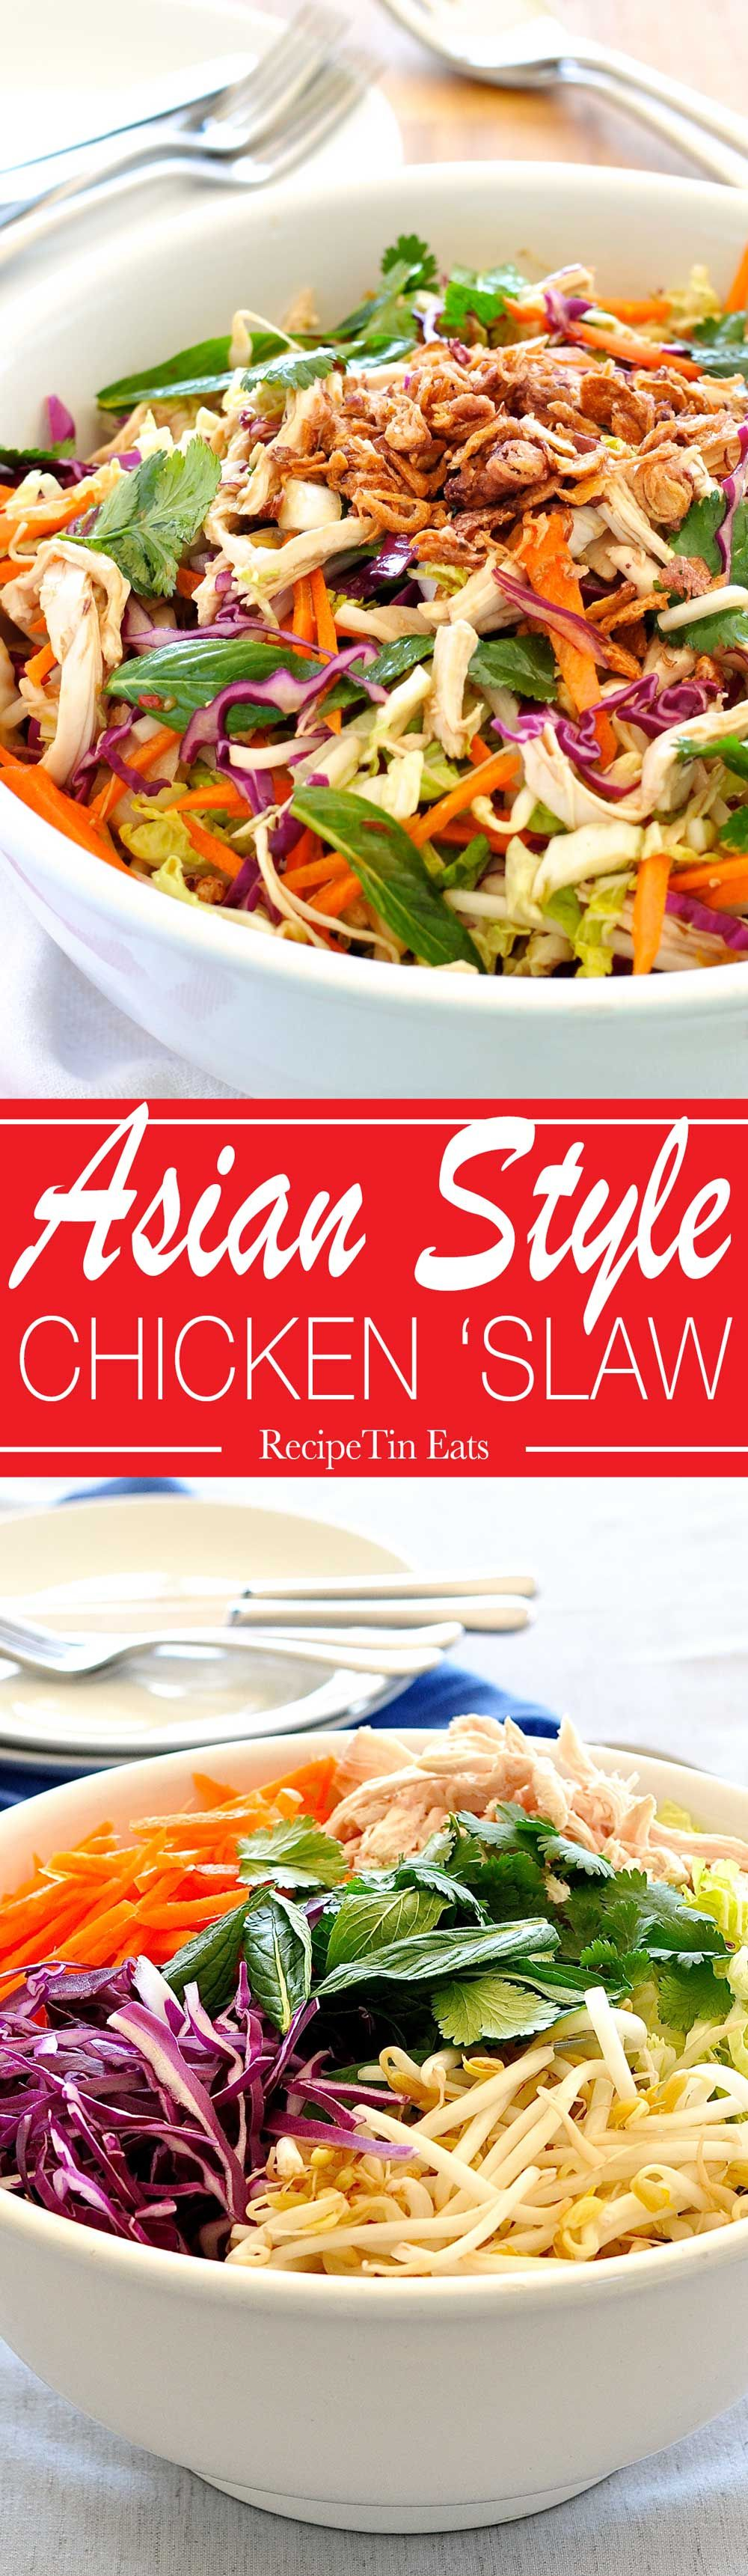 Asian Slaw Healthy Crunchy Asian Cabbage Salad Recipe Asian Chicken Salads Asian Slaw Asian Slaw Healthy